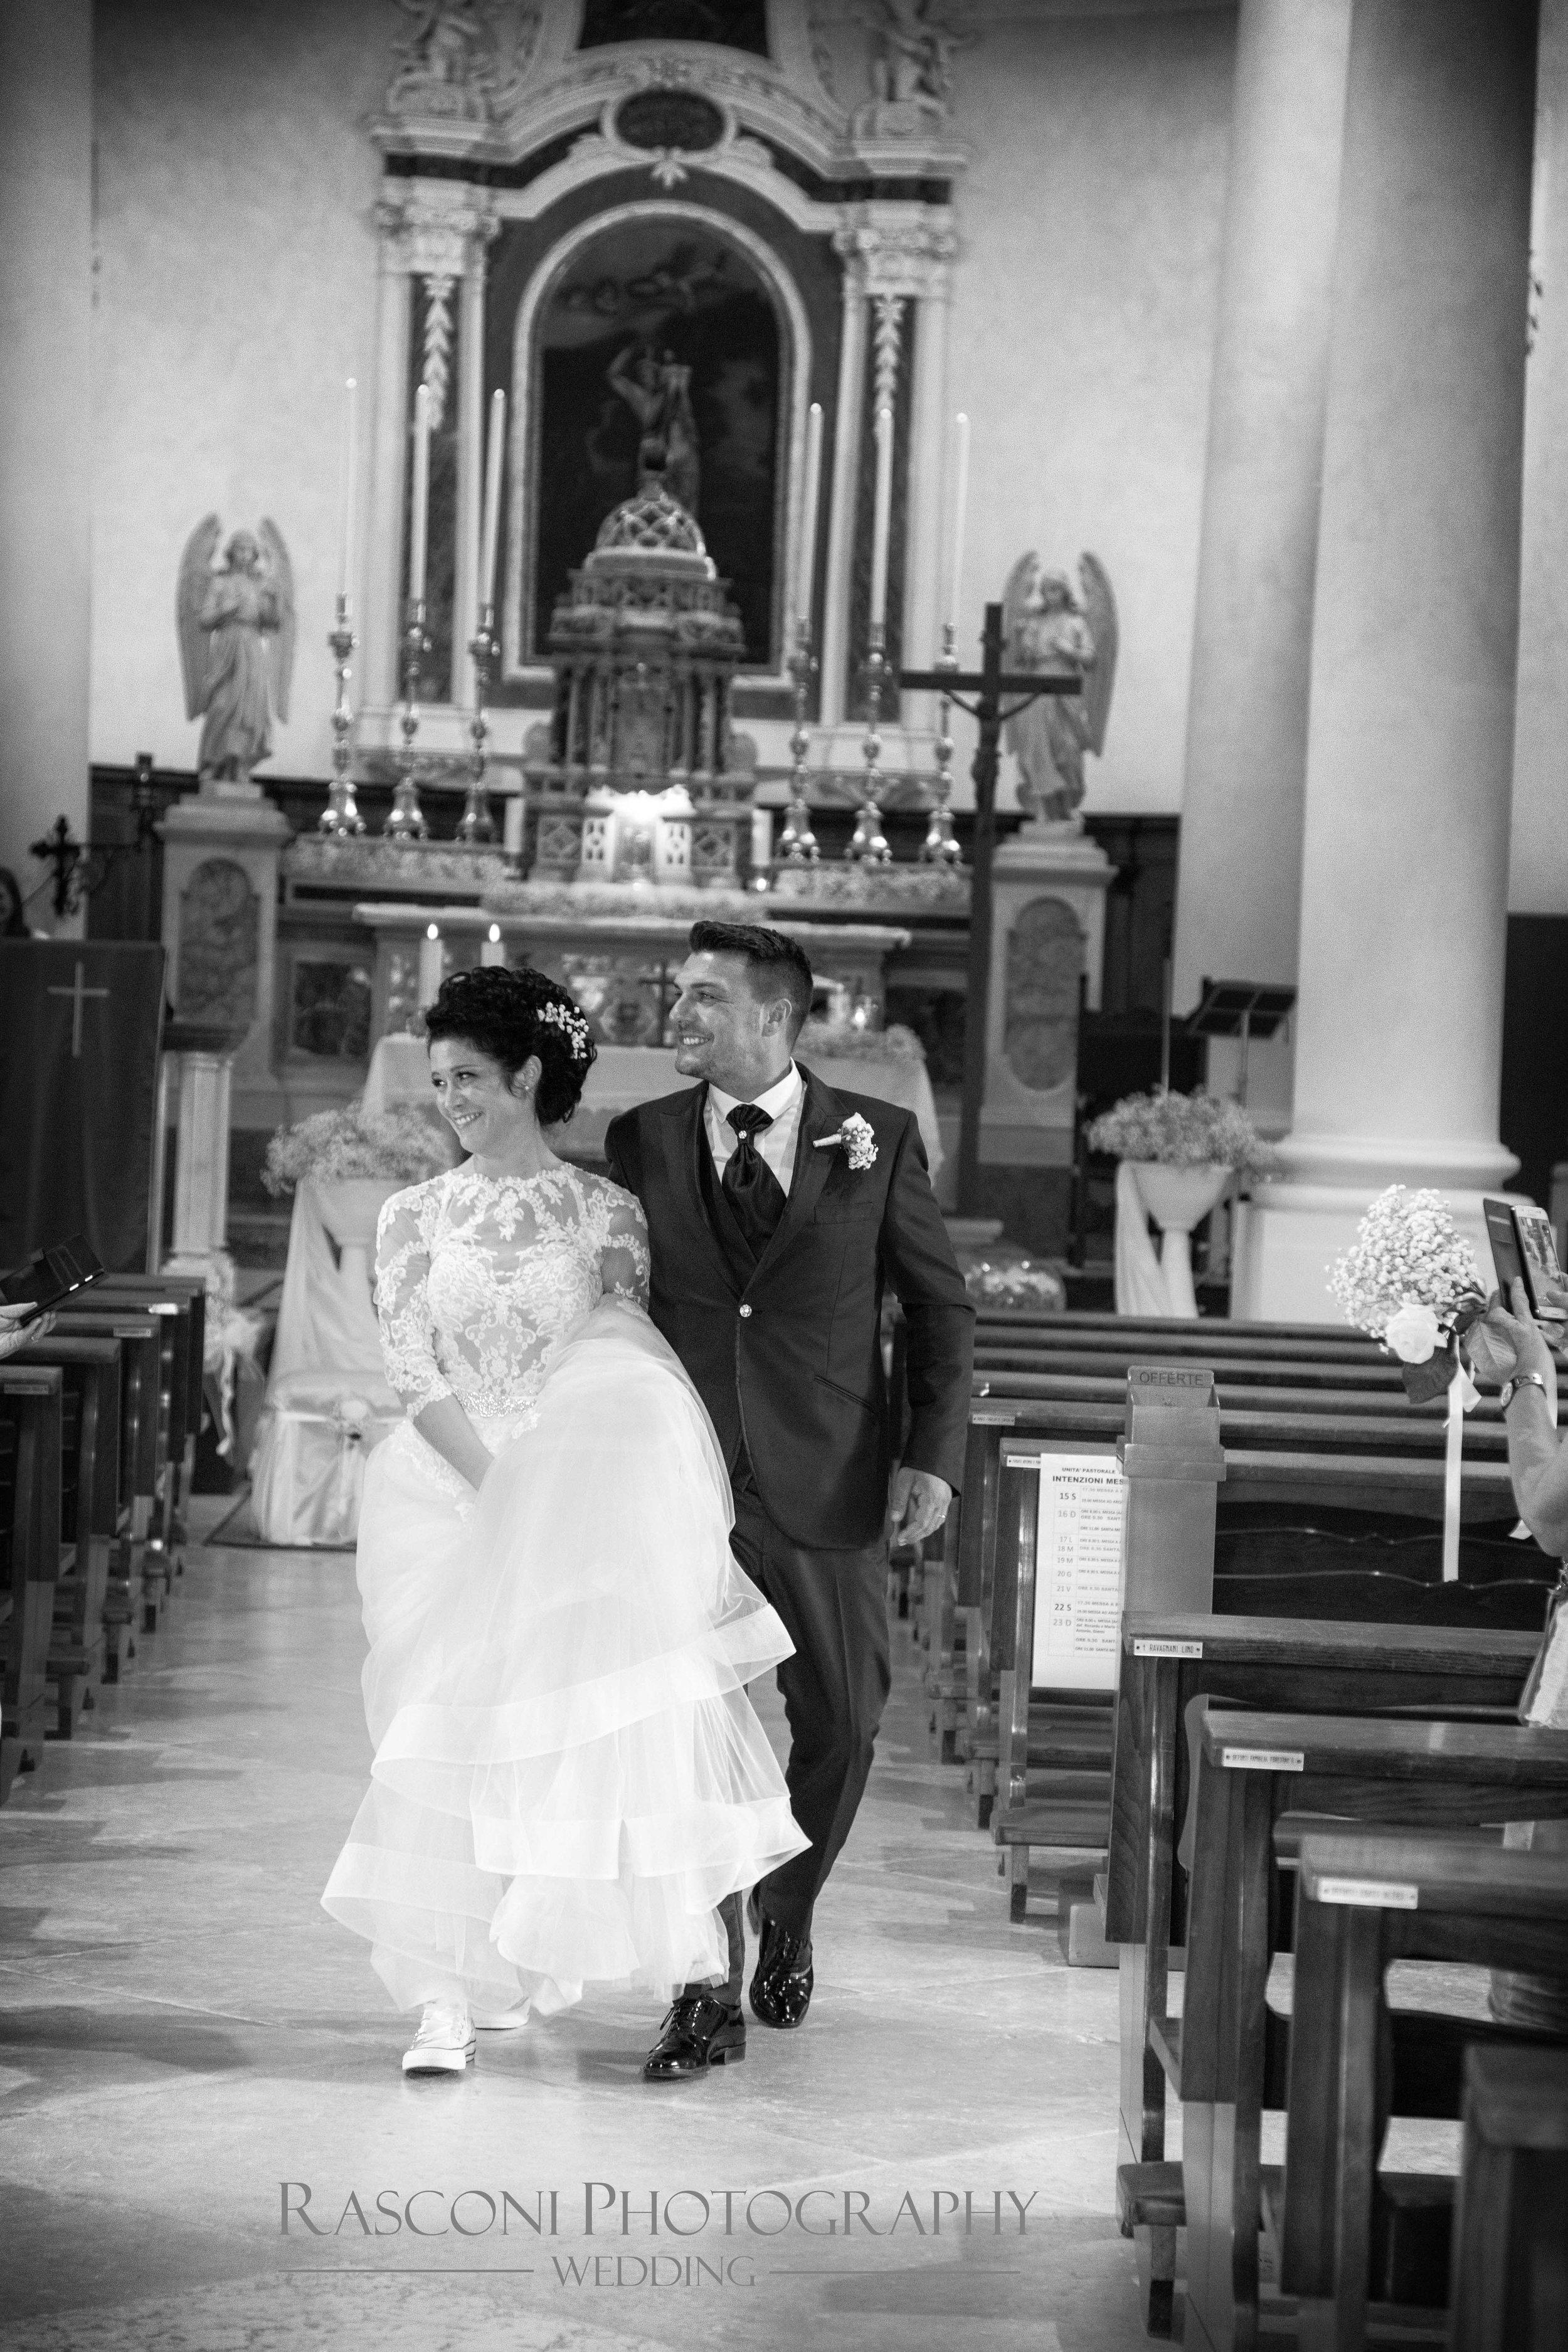 wedding-212 copy.jpg